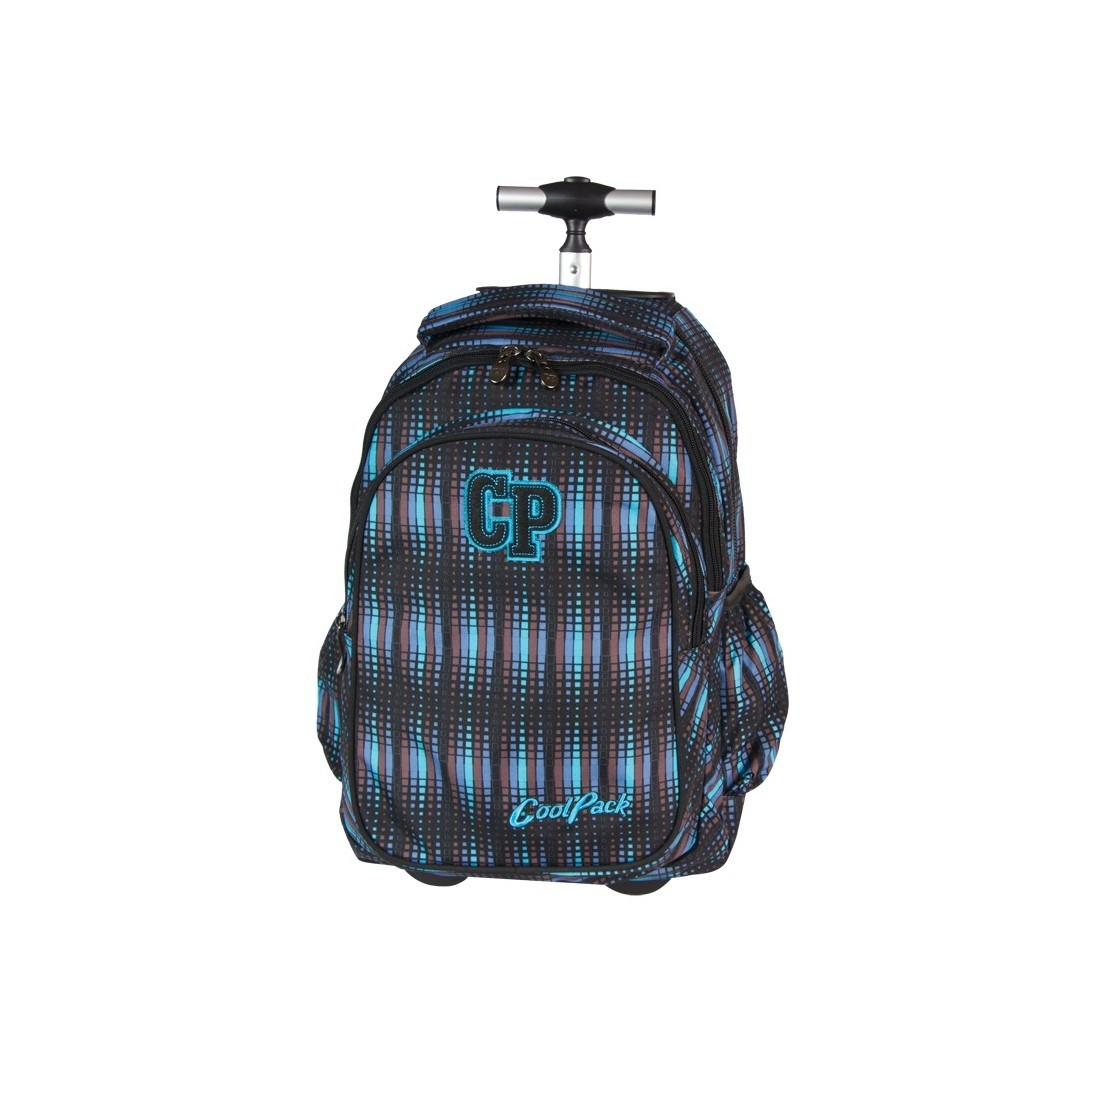 Plecak CoolPack na kółkach dla chłopca w paski - CP 232